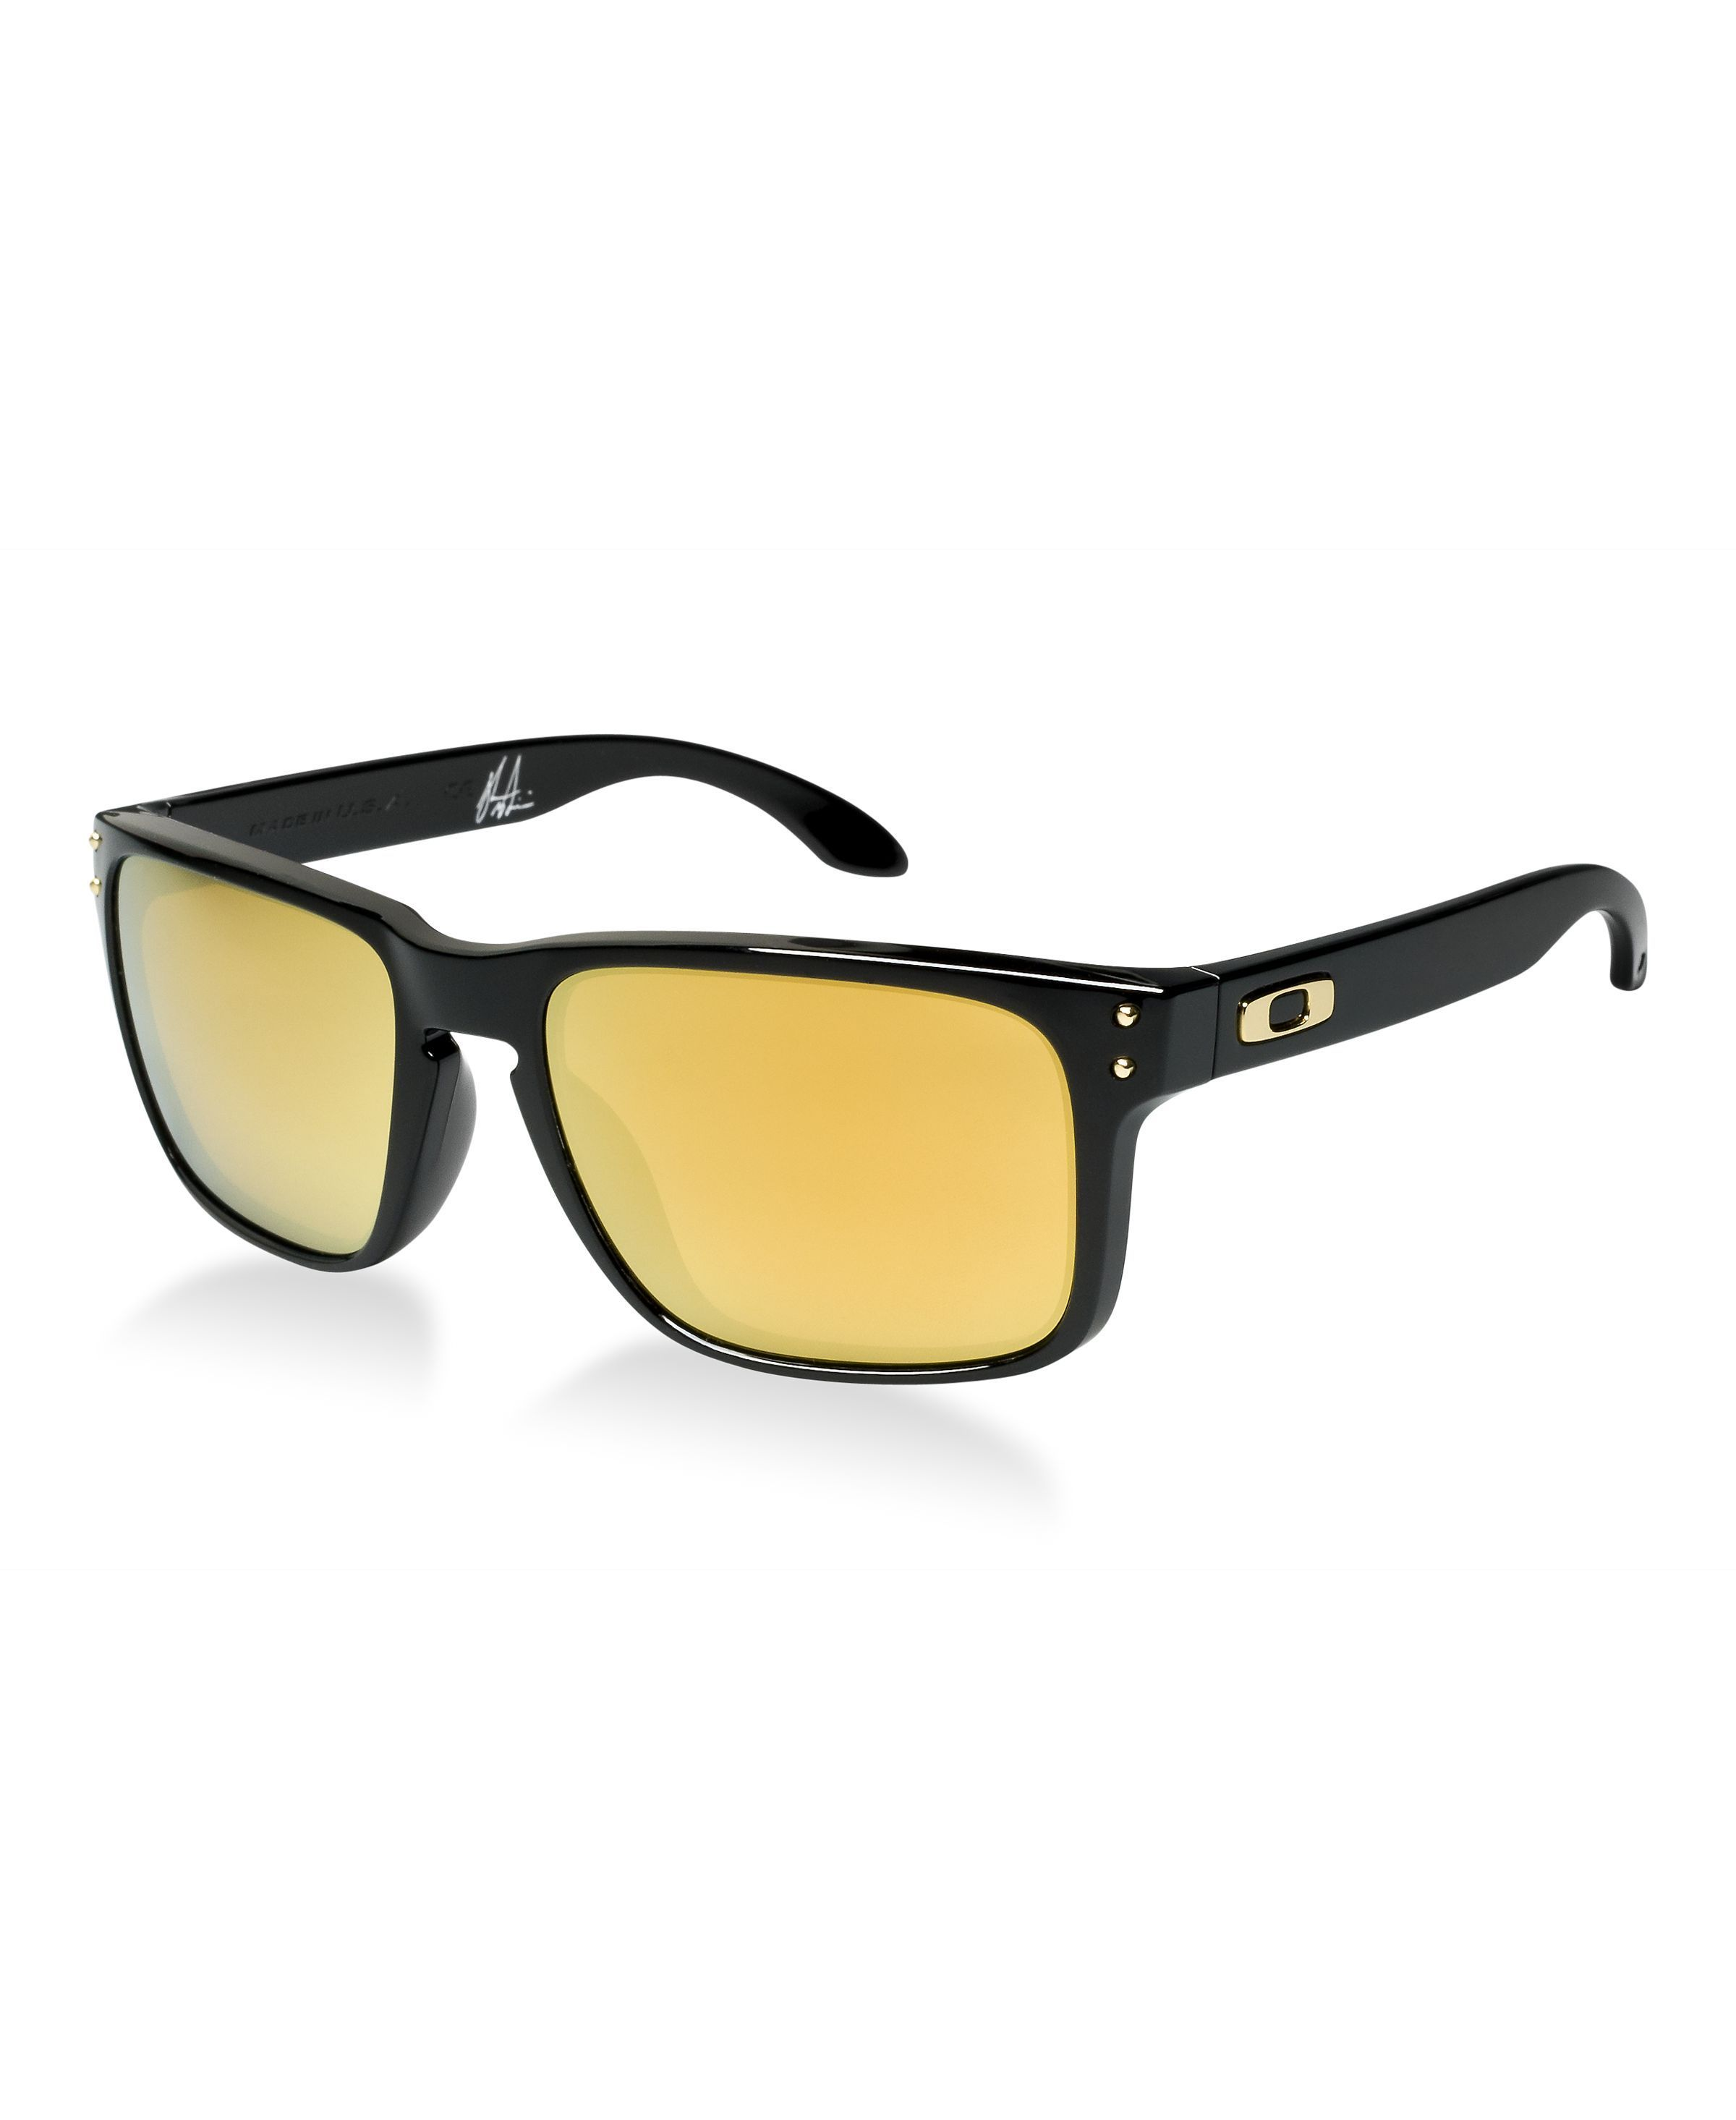 04a95cb830ef ahouiqwi on. Holbrook SunglassesSunglasses ...